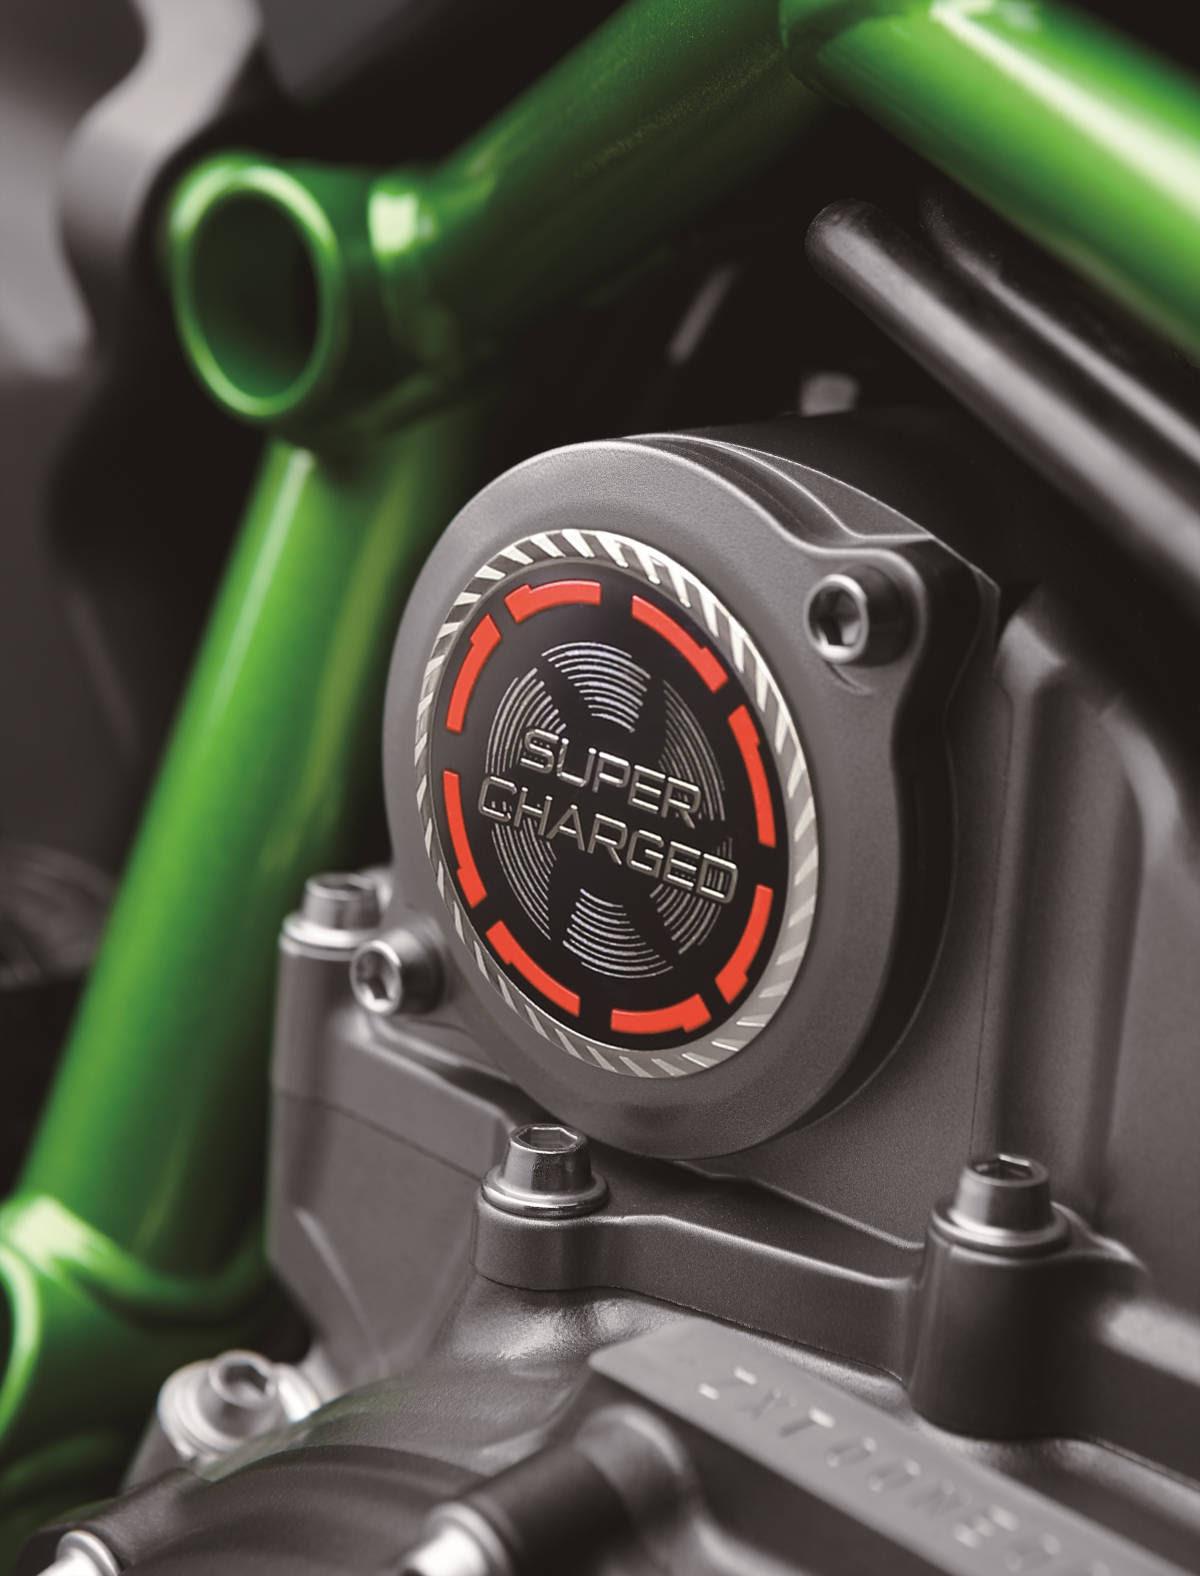 Kawasaki Announces Changes To 2019 Ninja H2 H2 Carbon And